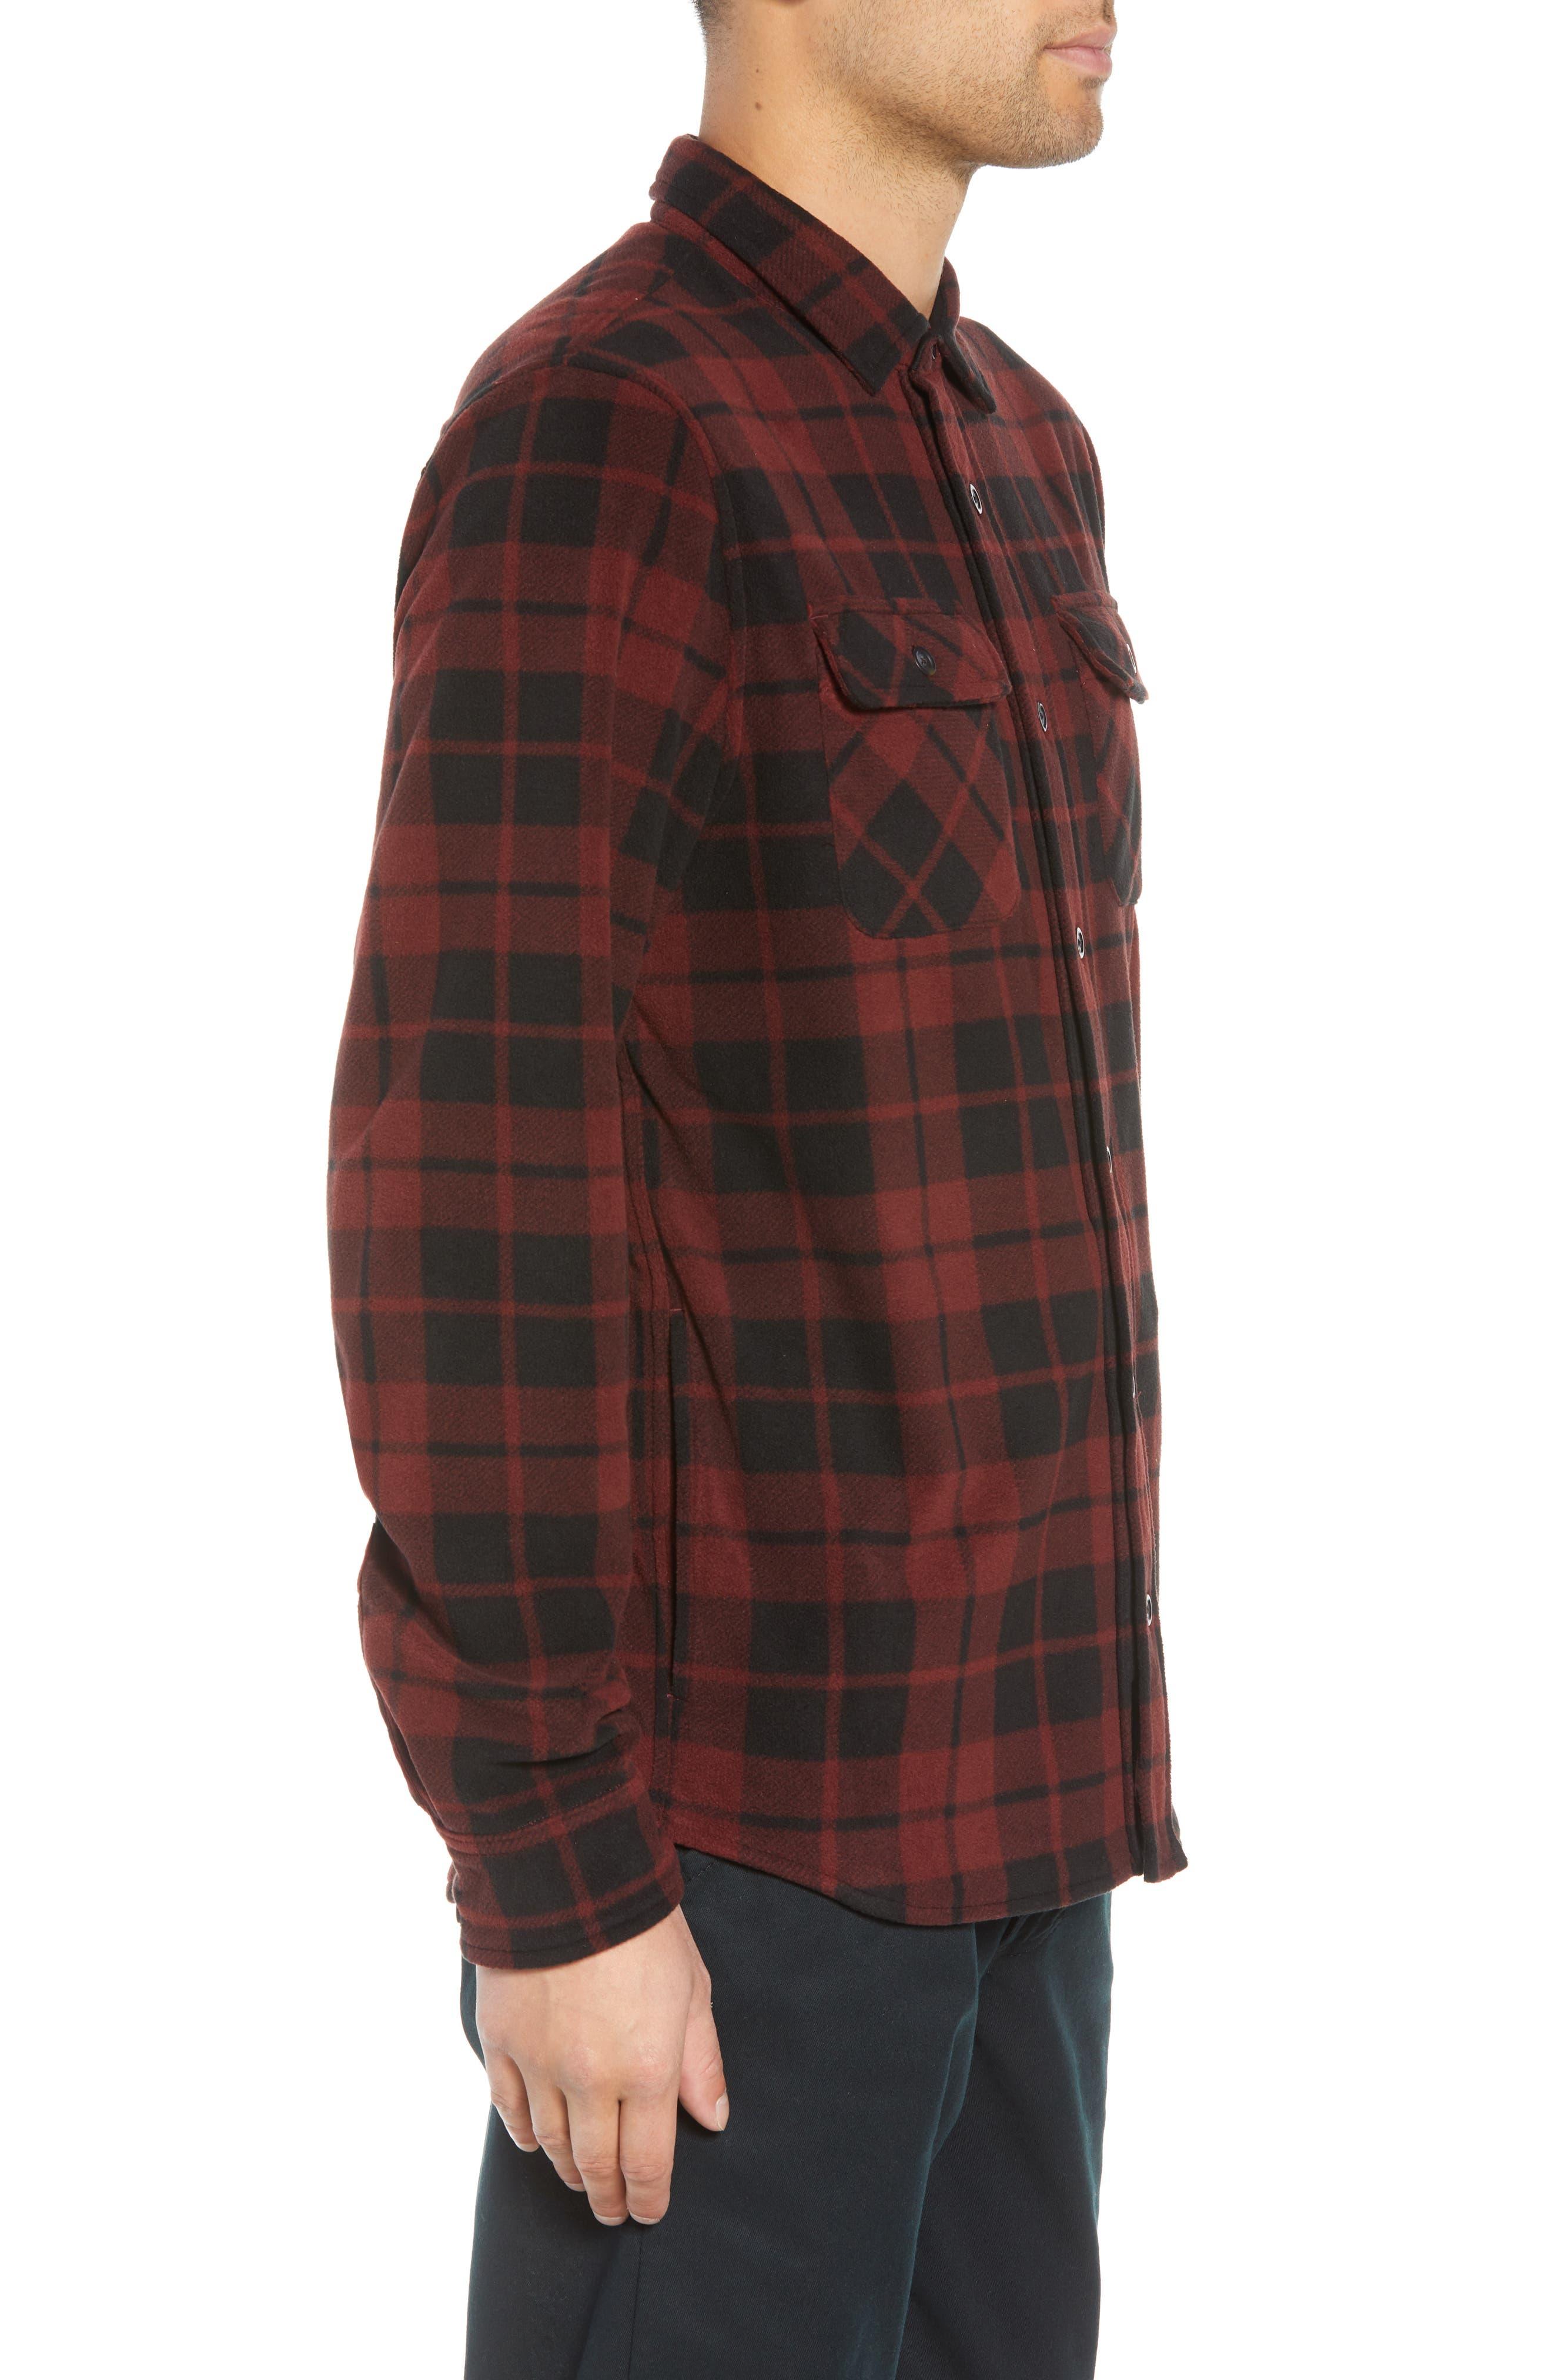 Hillcrest Fleece Shirt,                             Alternate thumbnail 3, color,                             930